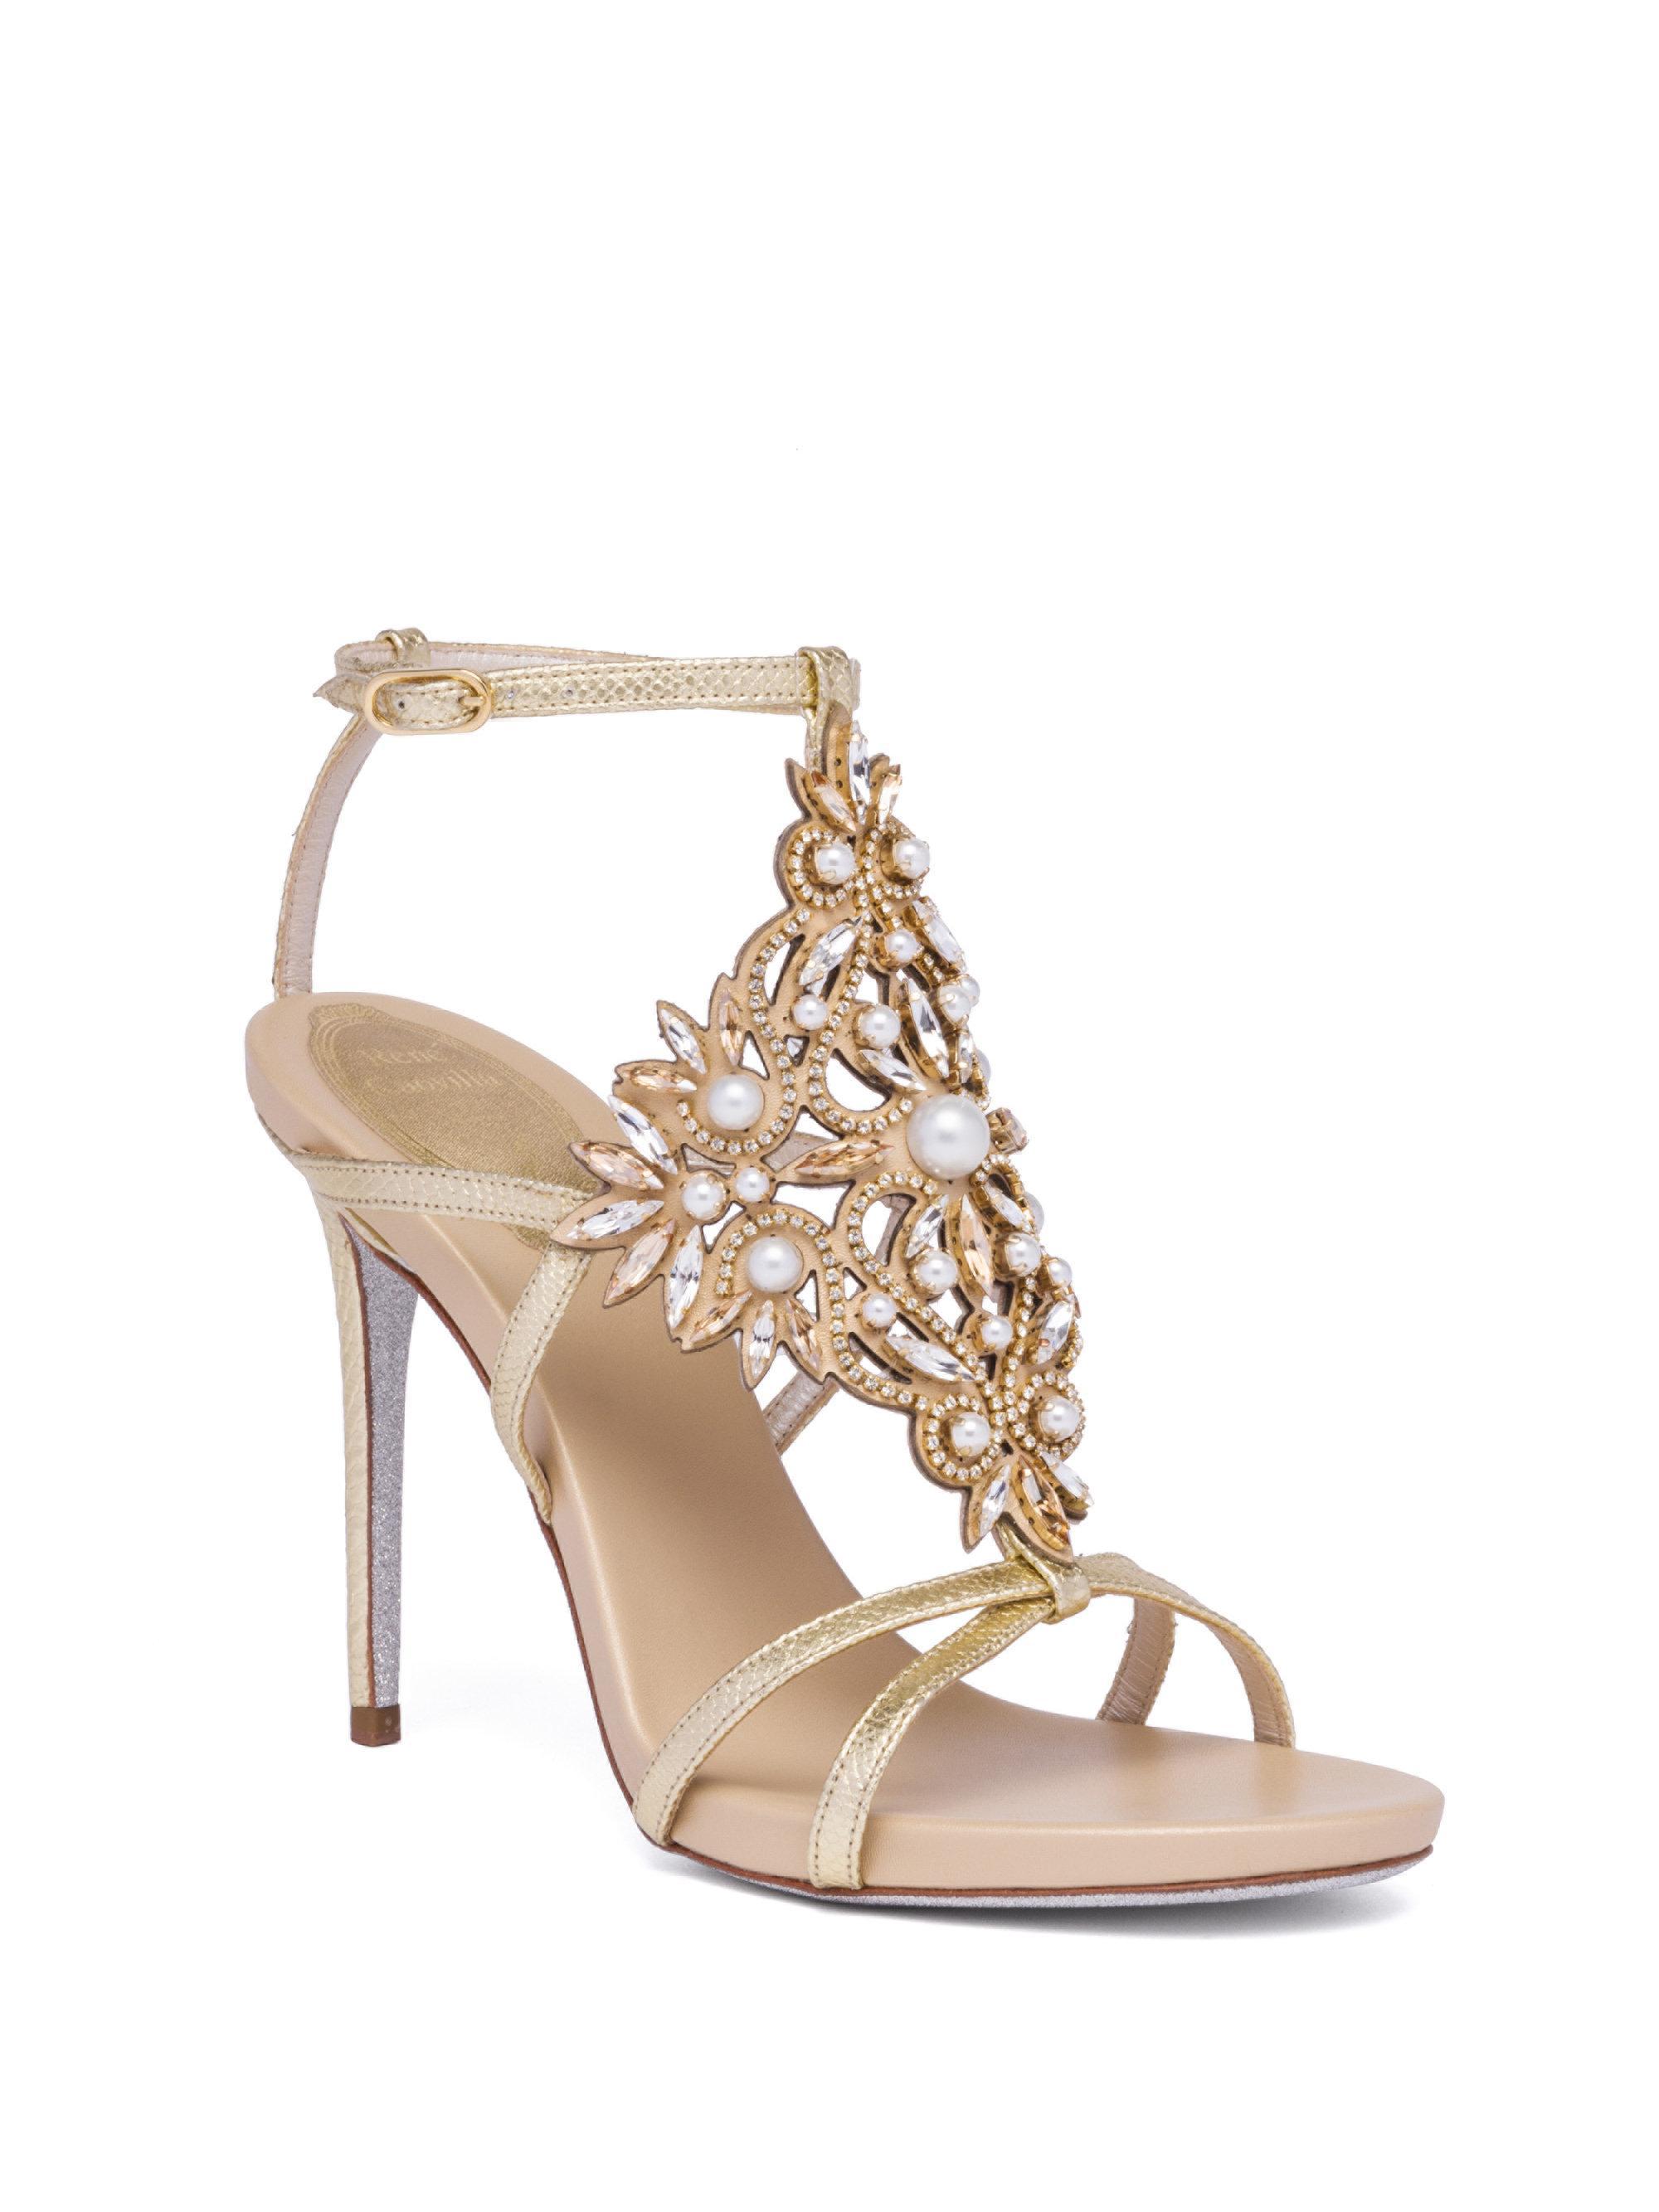 René Caovilla Embellished Metallic Sandals clearance geniue stockist dBlbjJO